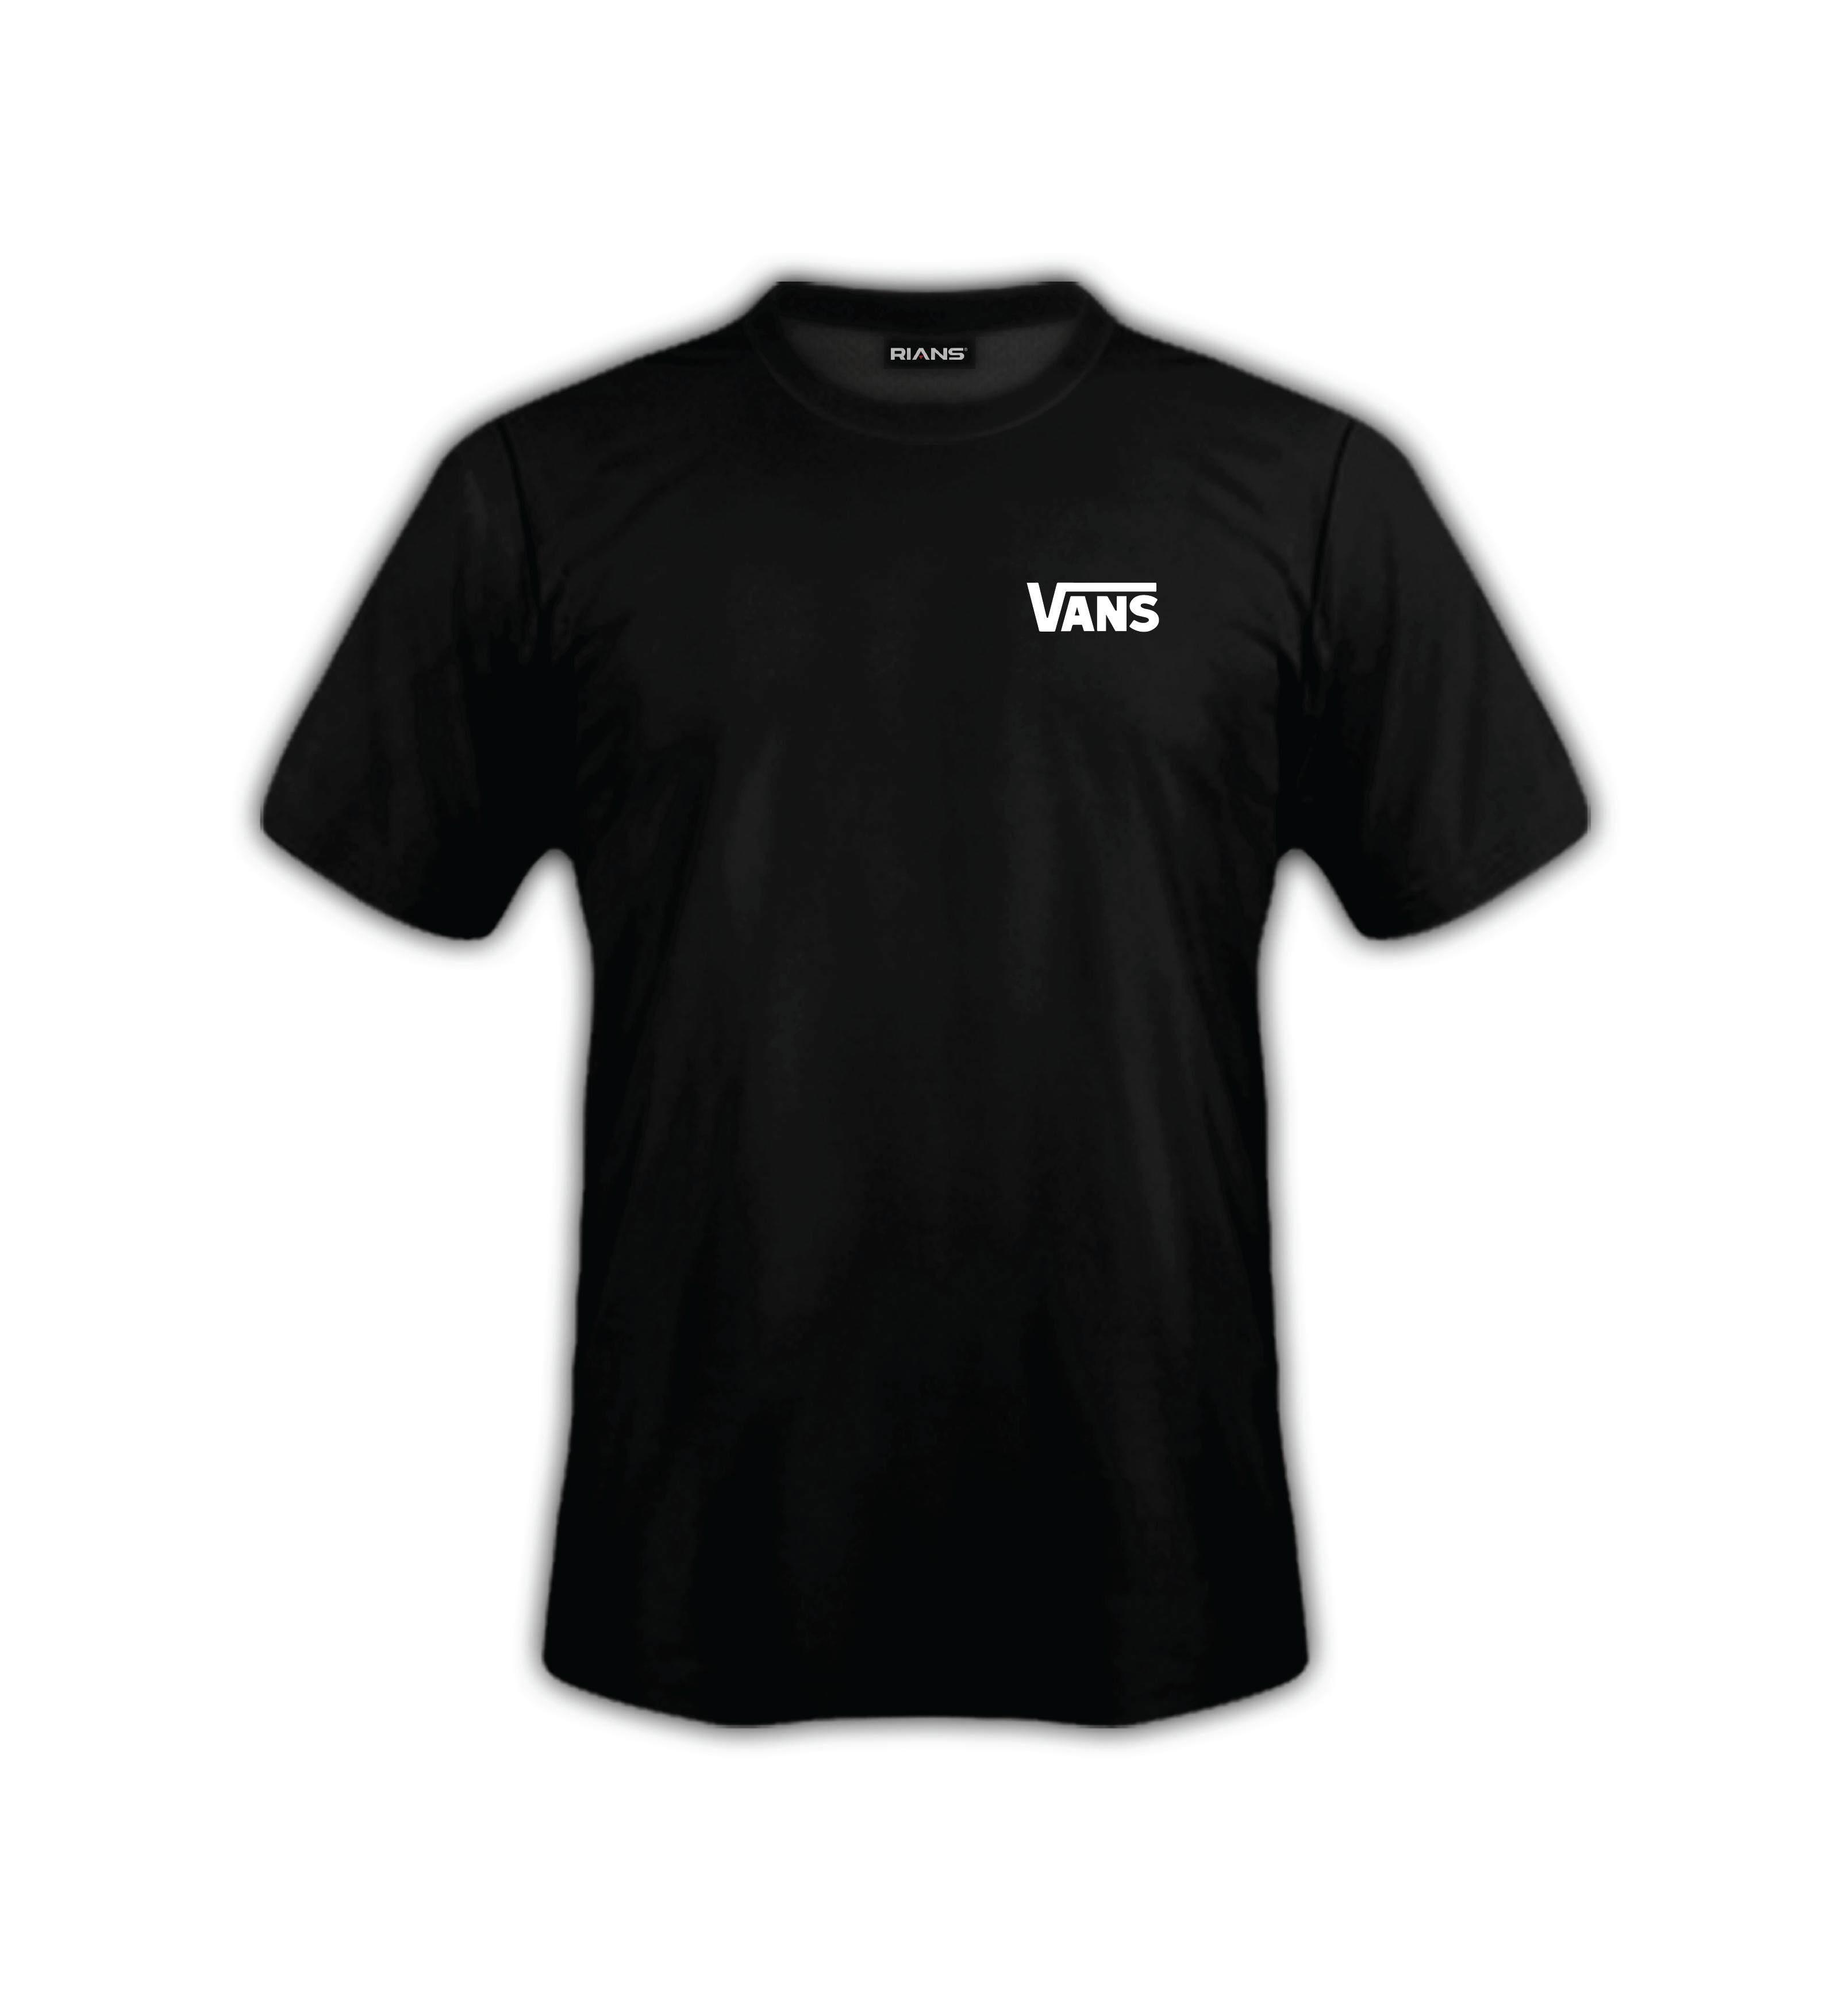 T-Shirt VANS Left 100% Cotton Baju Tshirt Black White Hitam Putih Bossku